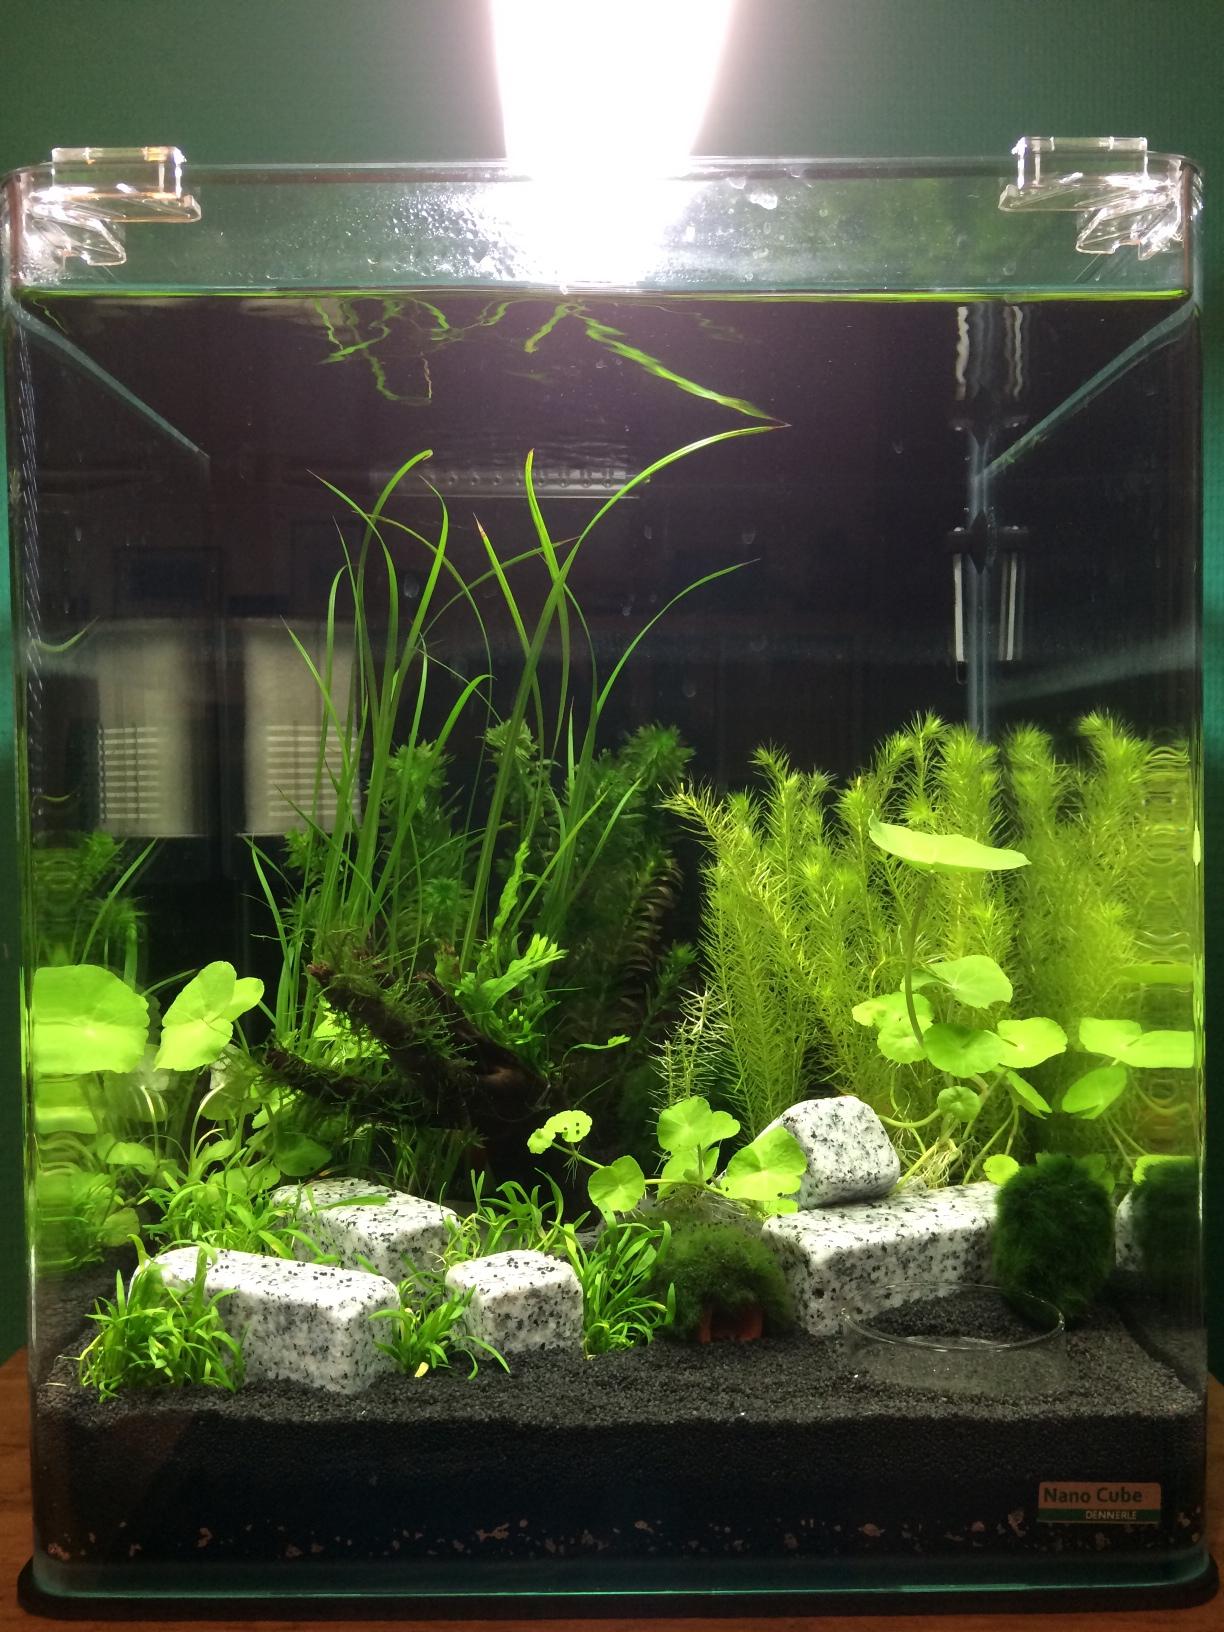 Nano aquarium einrichten dscf with nano aquarium einrichten interesting hierfr sollte man sich - Nano aquarium deko ...